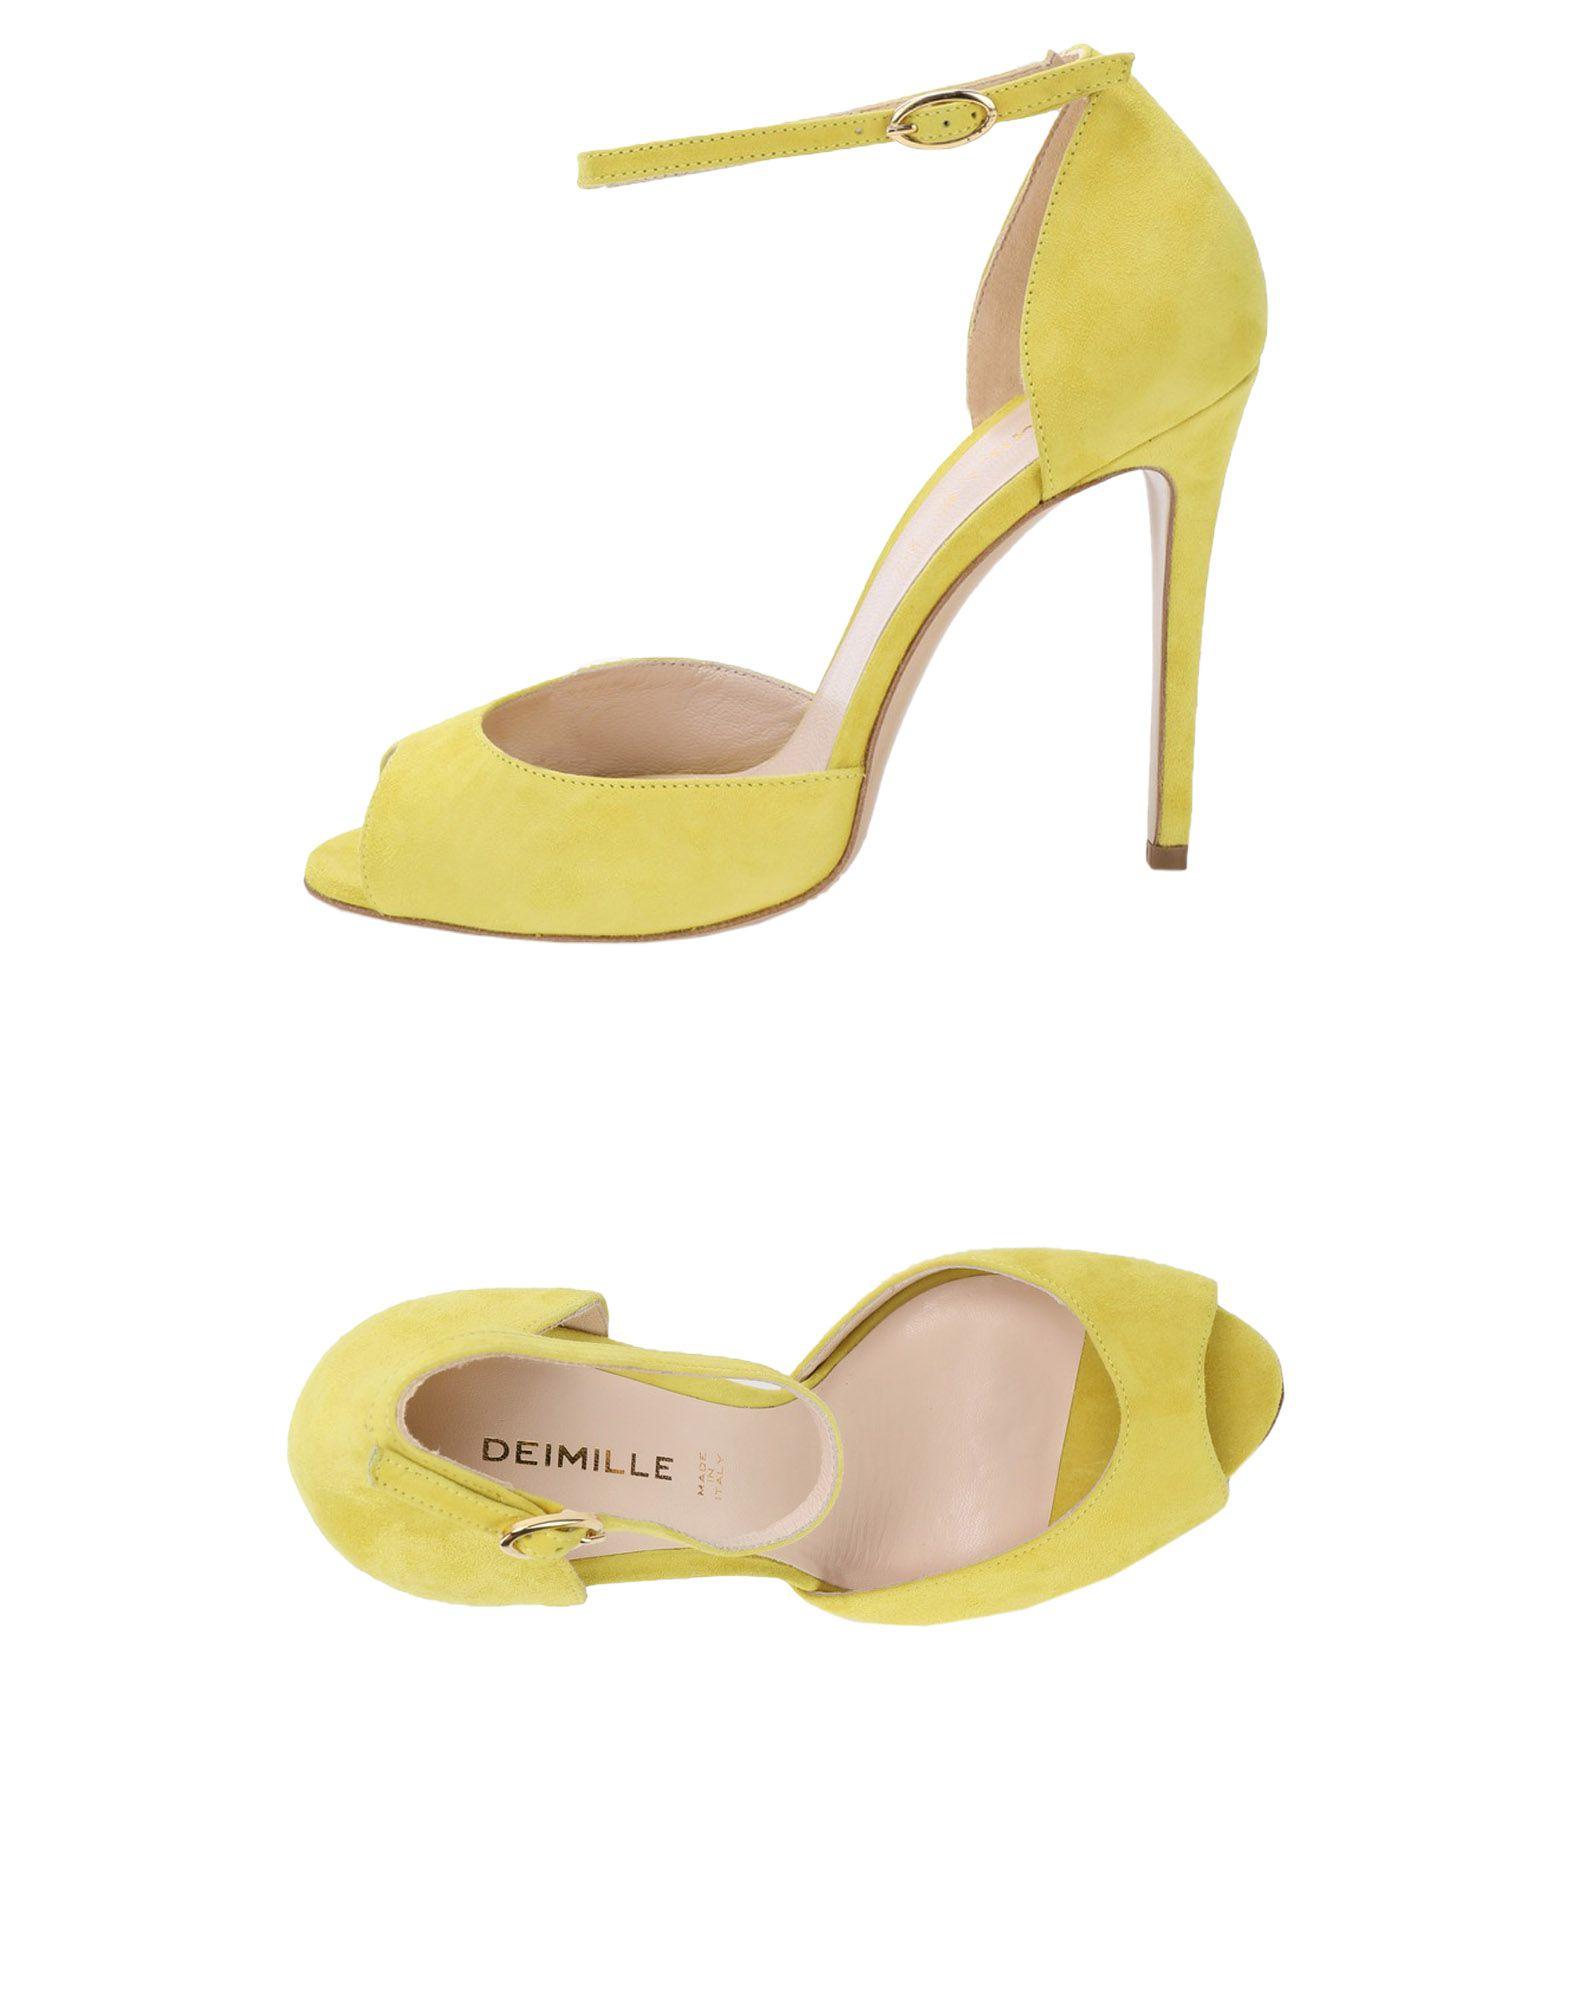 Moda Sandali Sandali Moda Deimille Donna - 11358221TR 911022